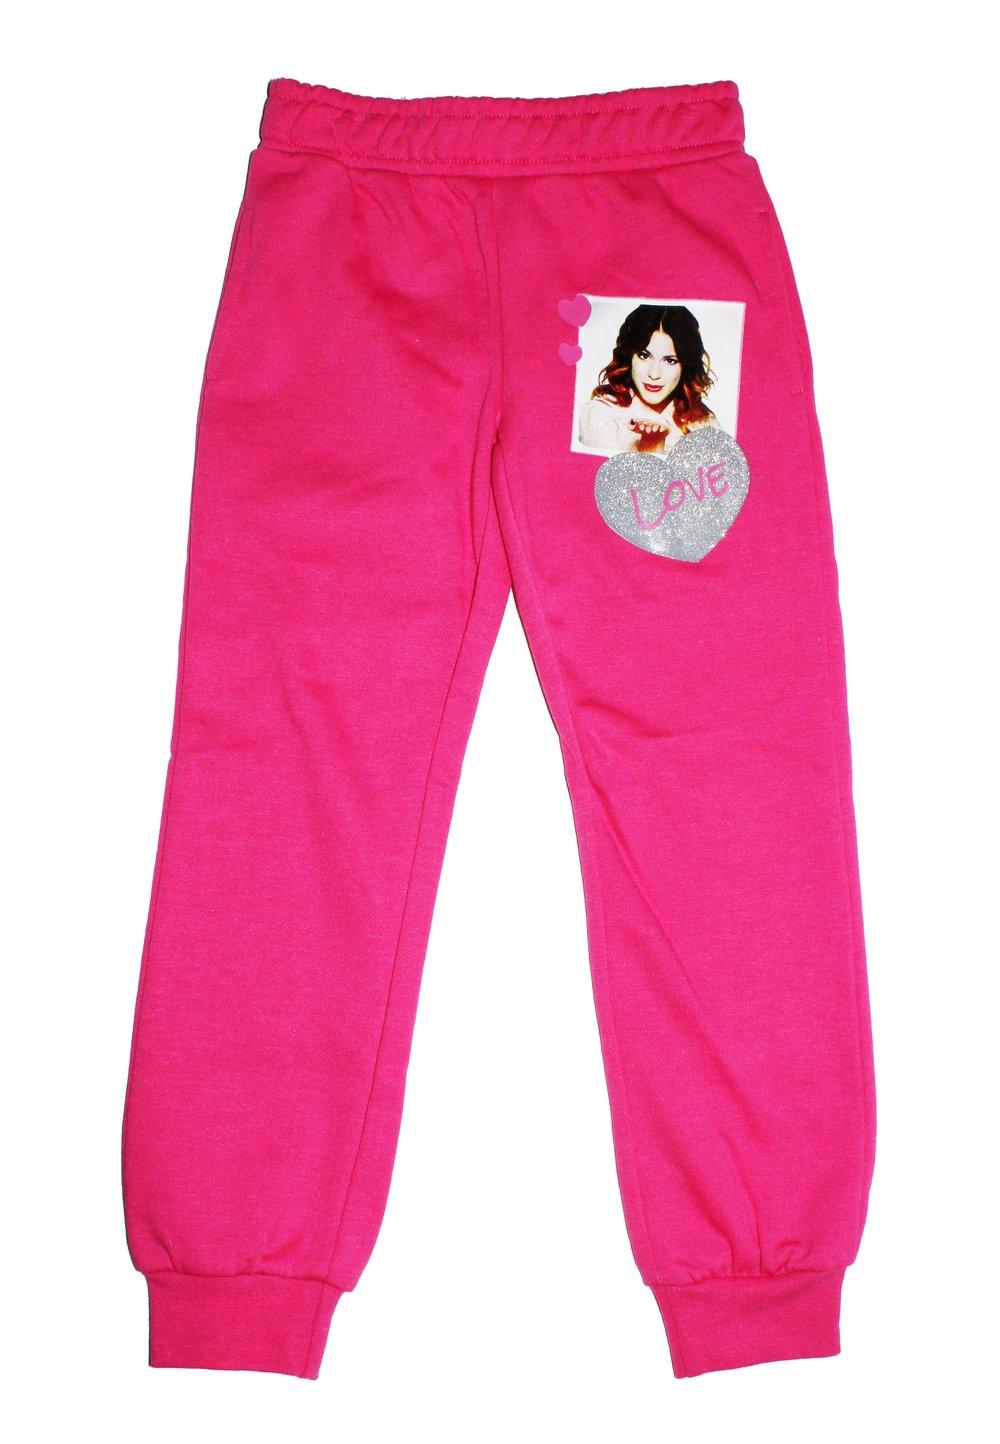 Pantaloni trening, Violetta, roz imagine